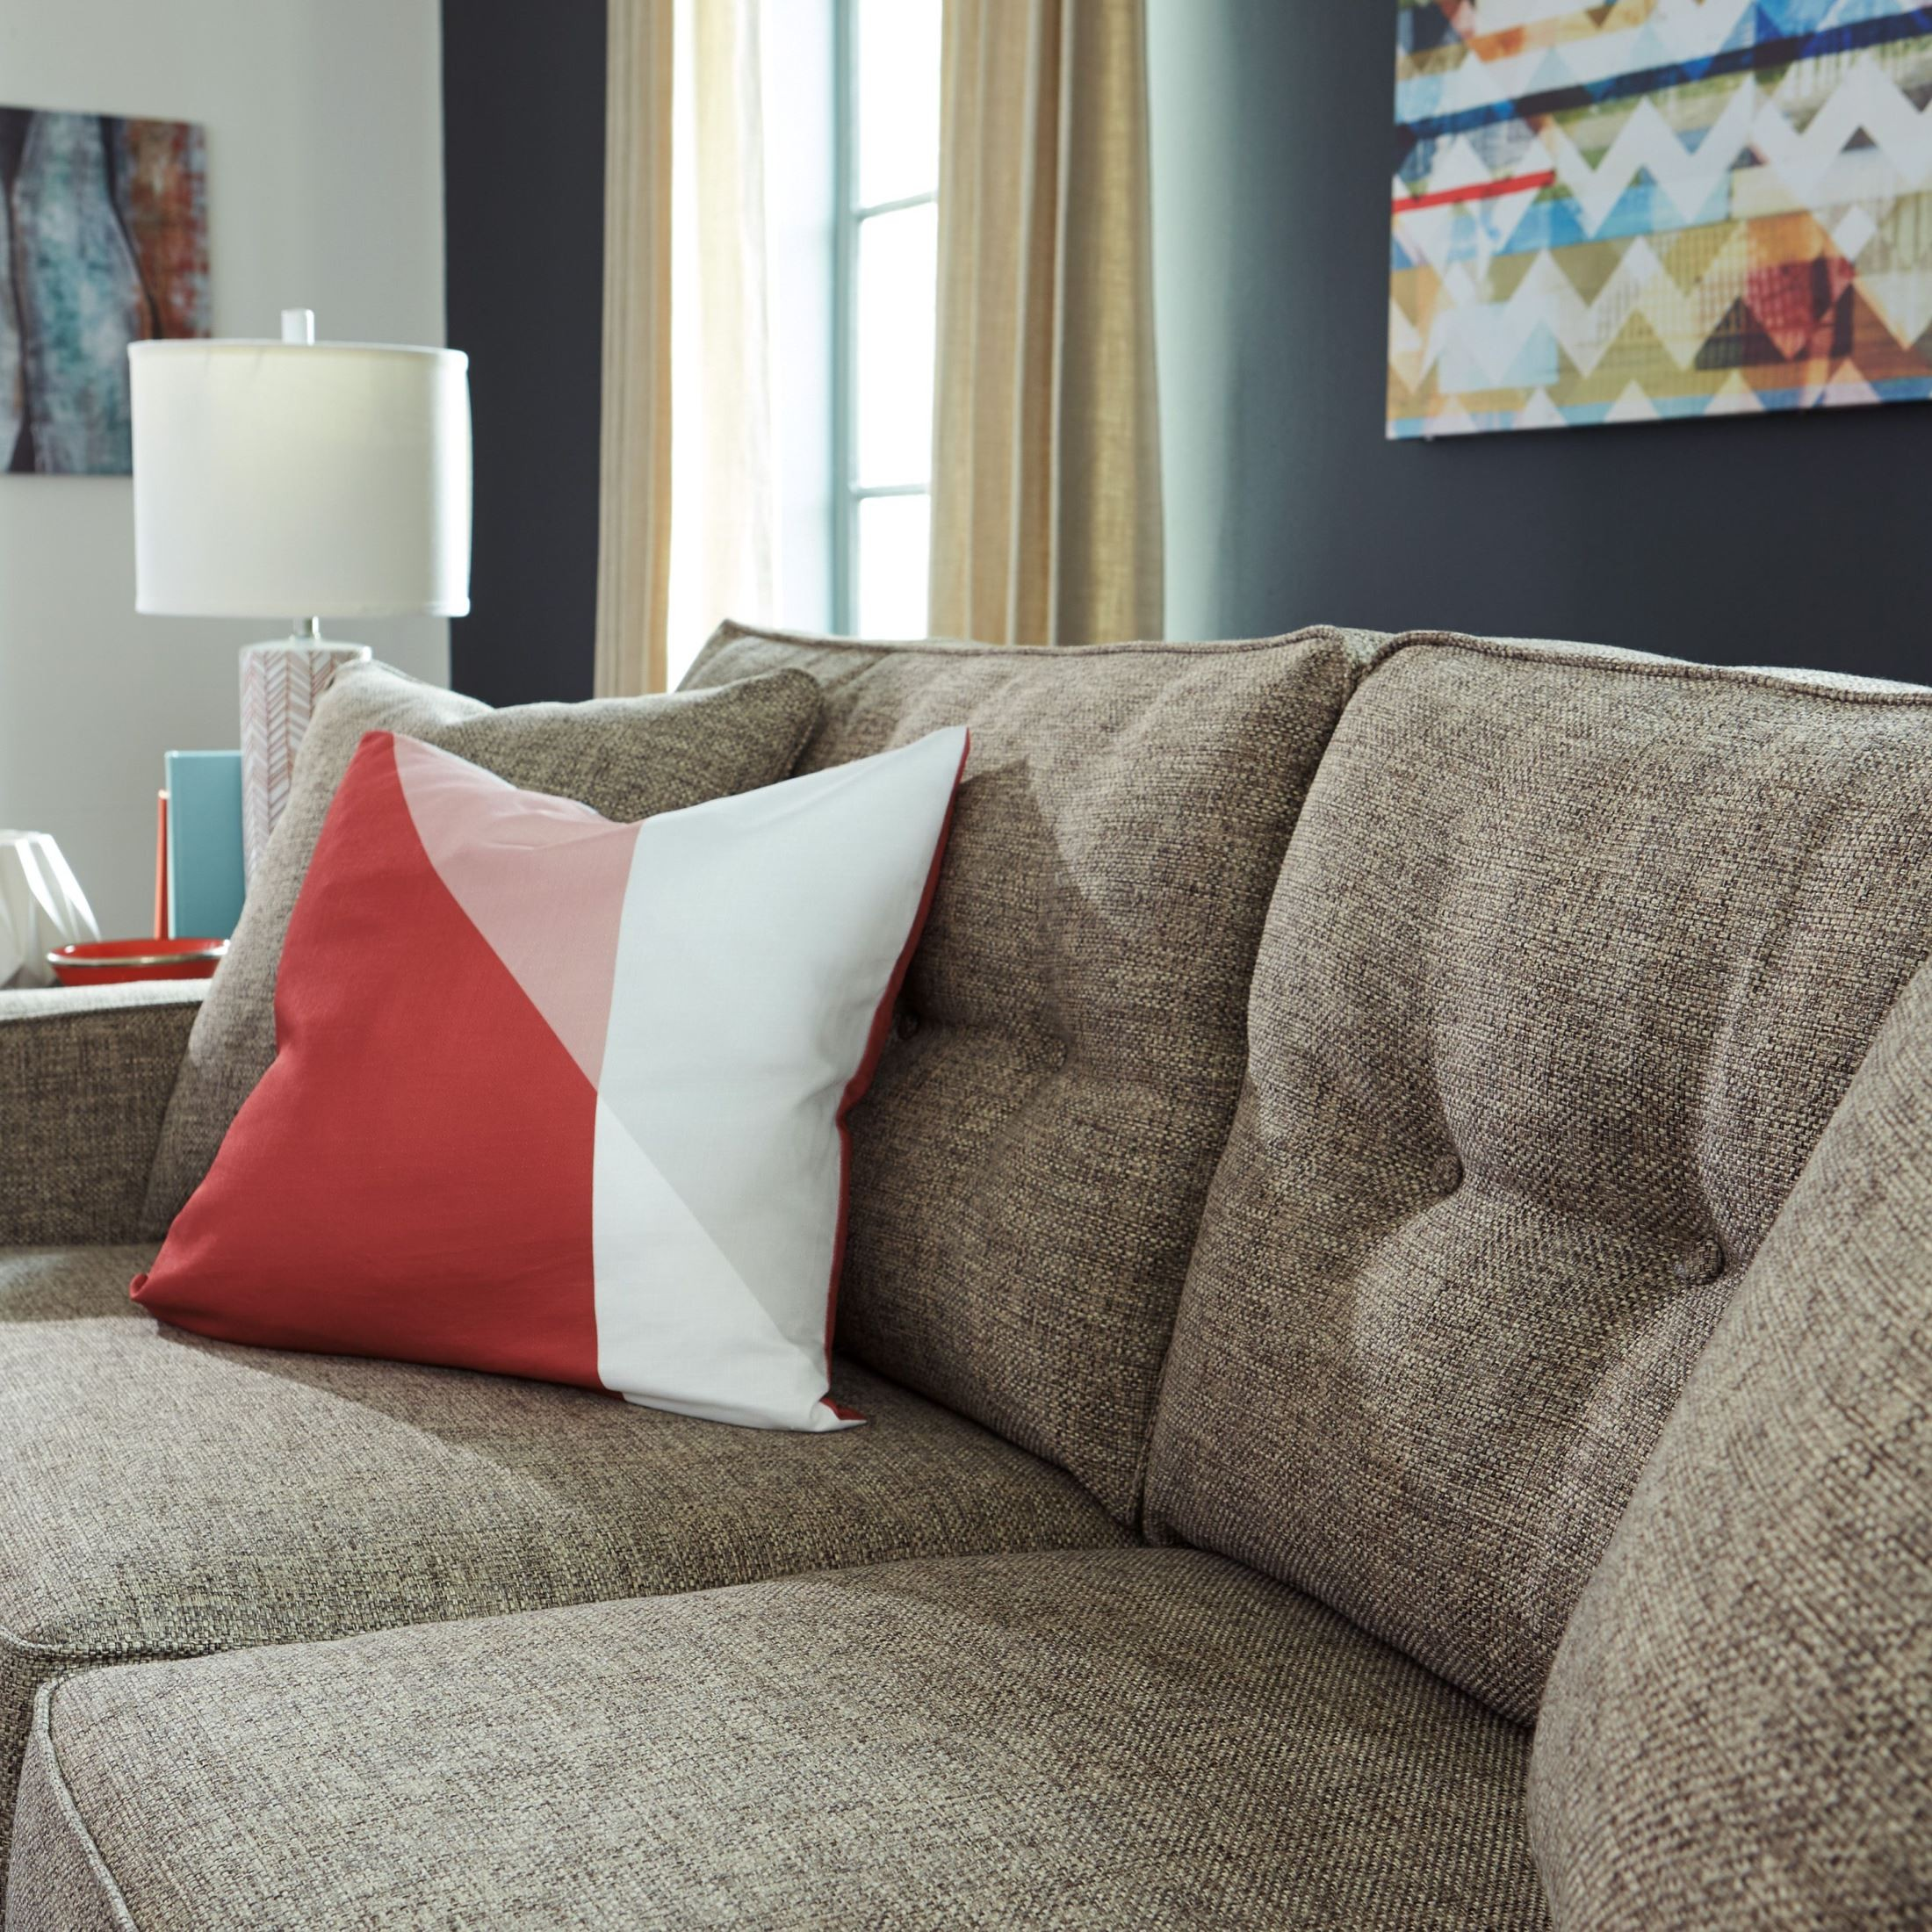 ashley sofa sale single seater corner dahra jute from   coleman furniture